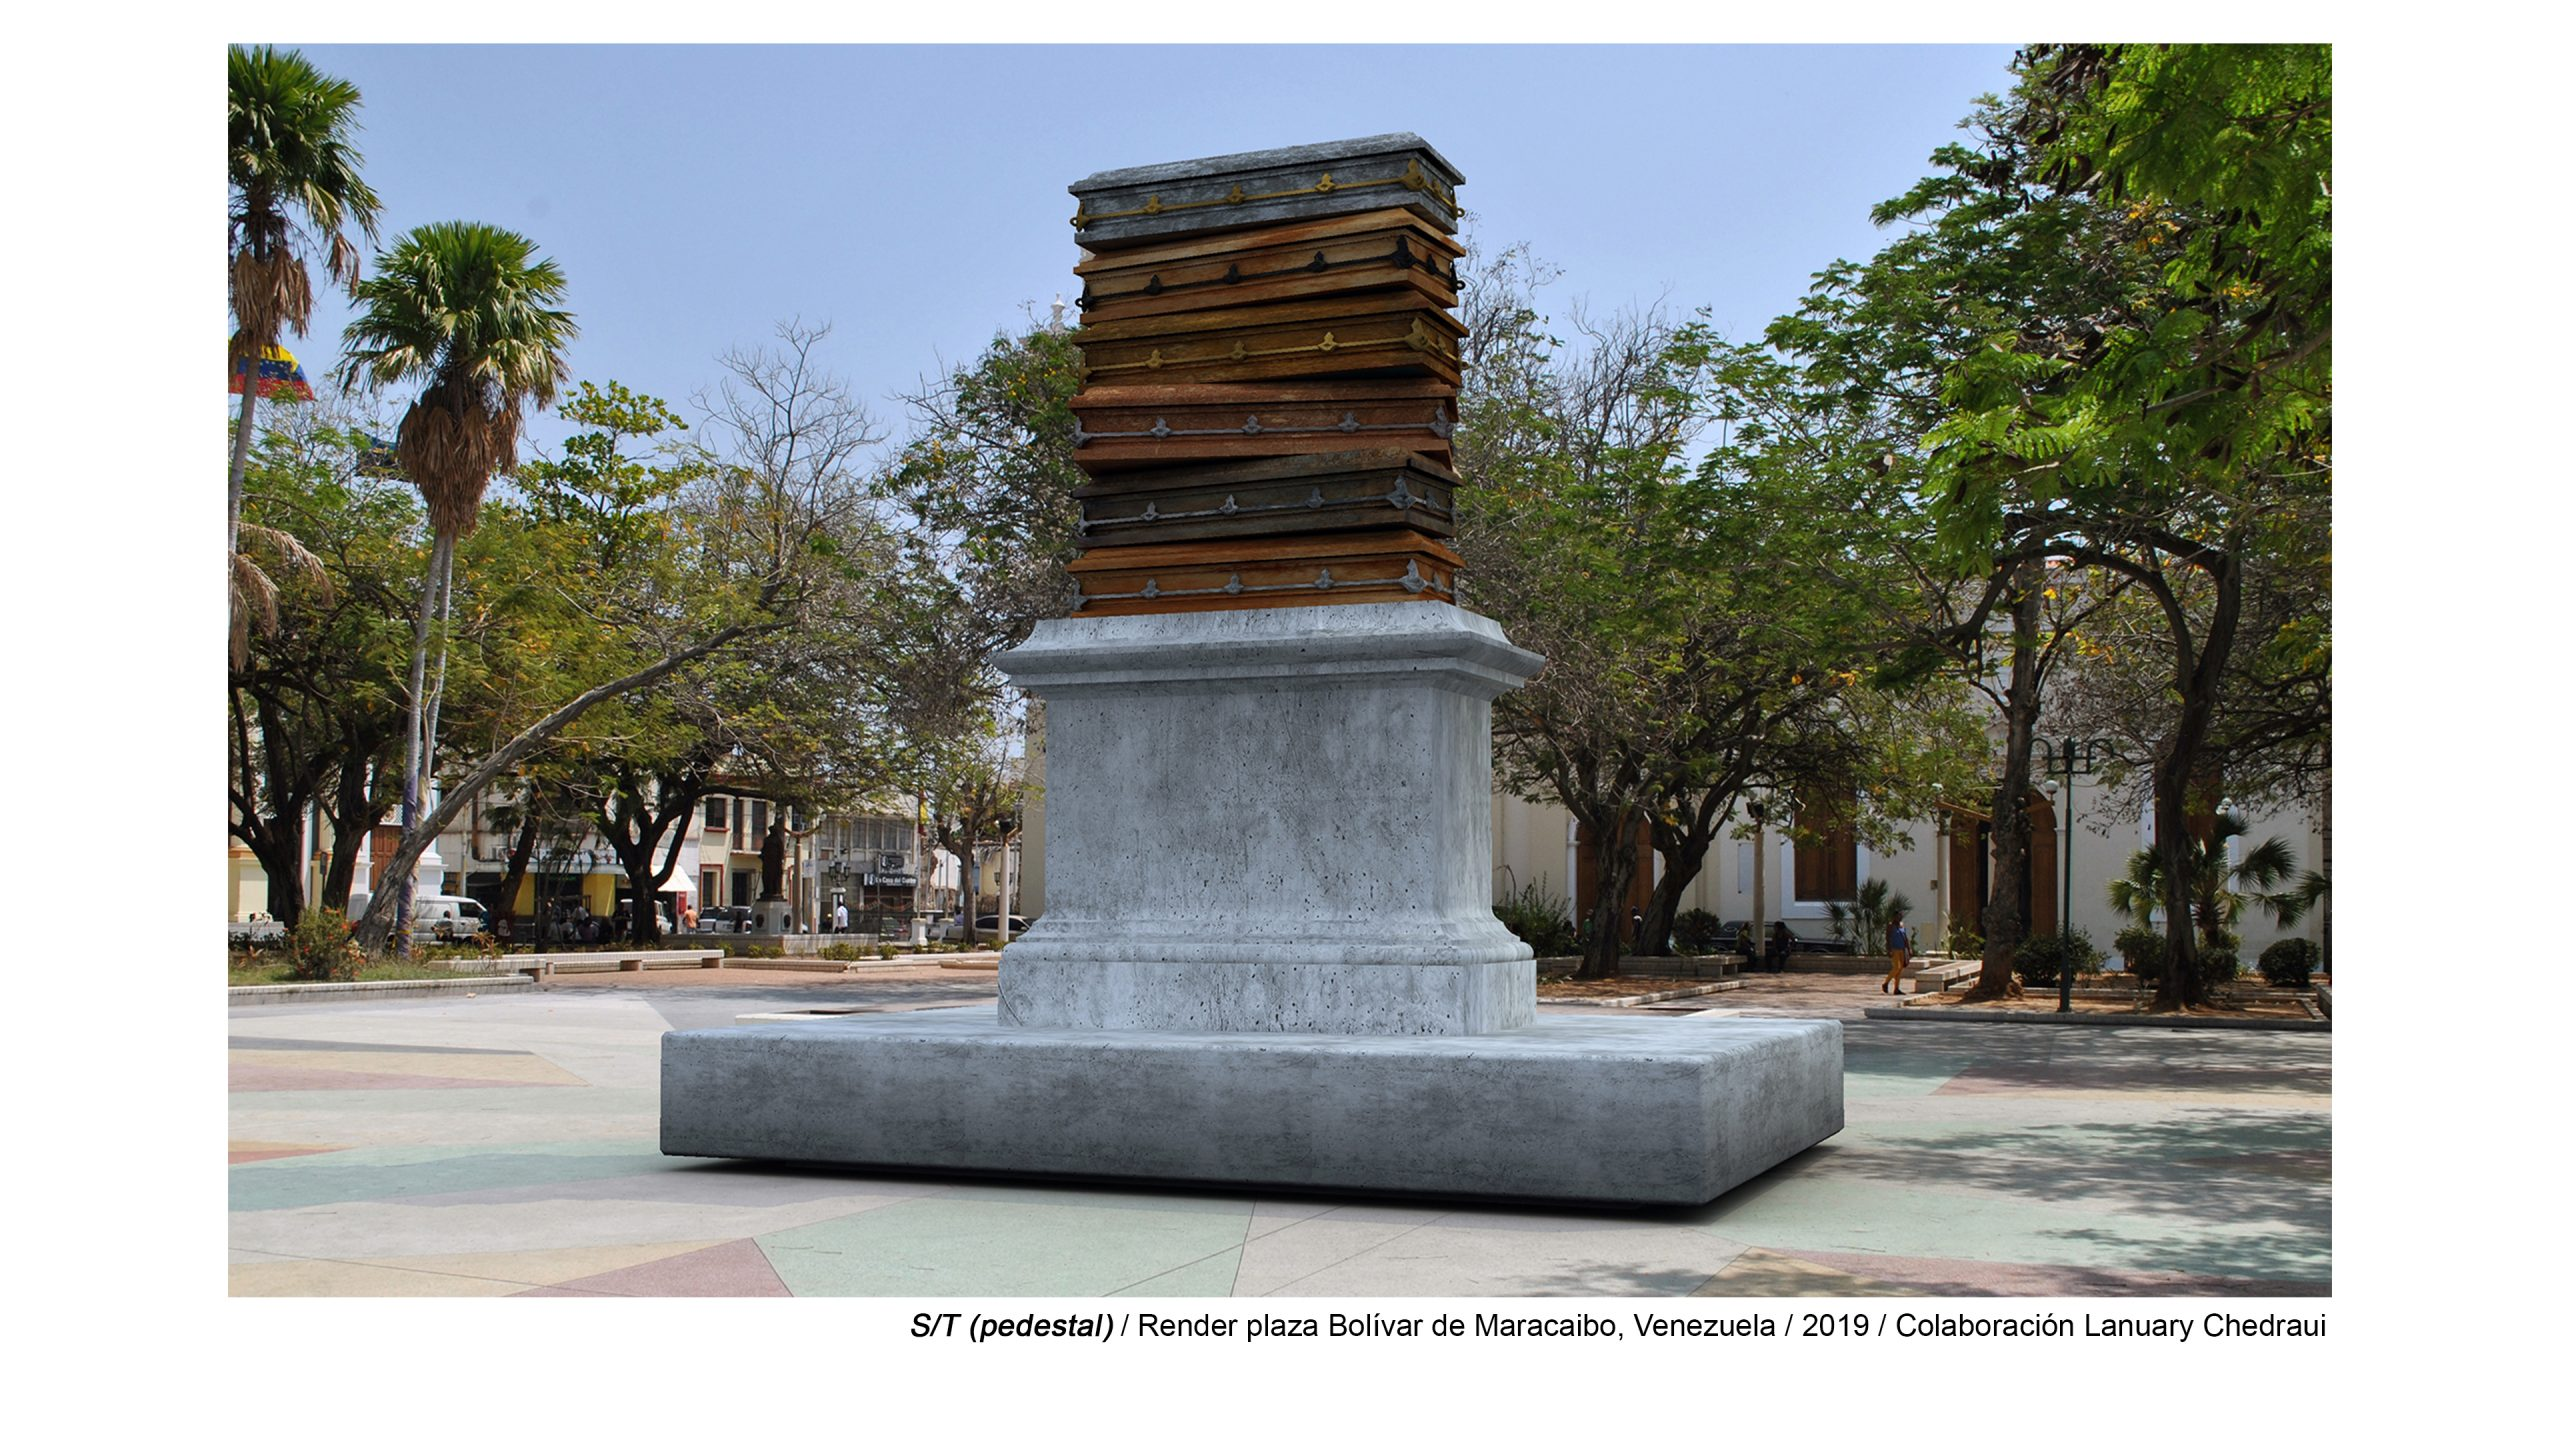 9 - Pedestal